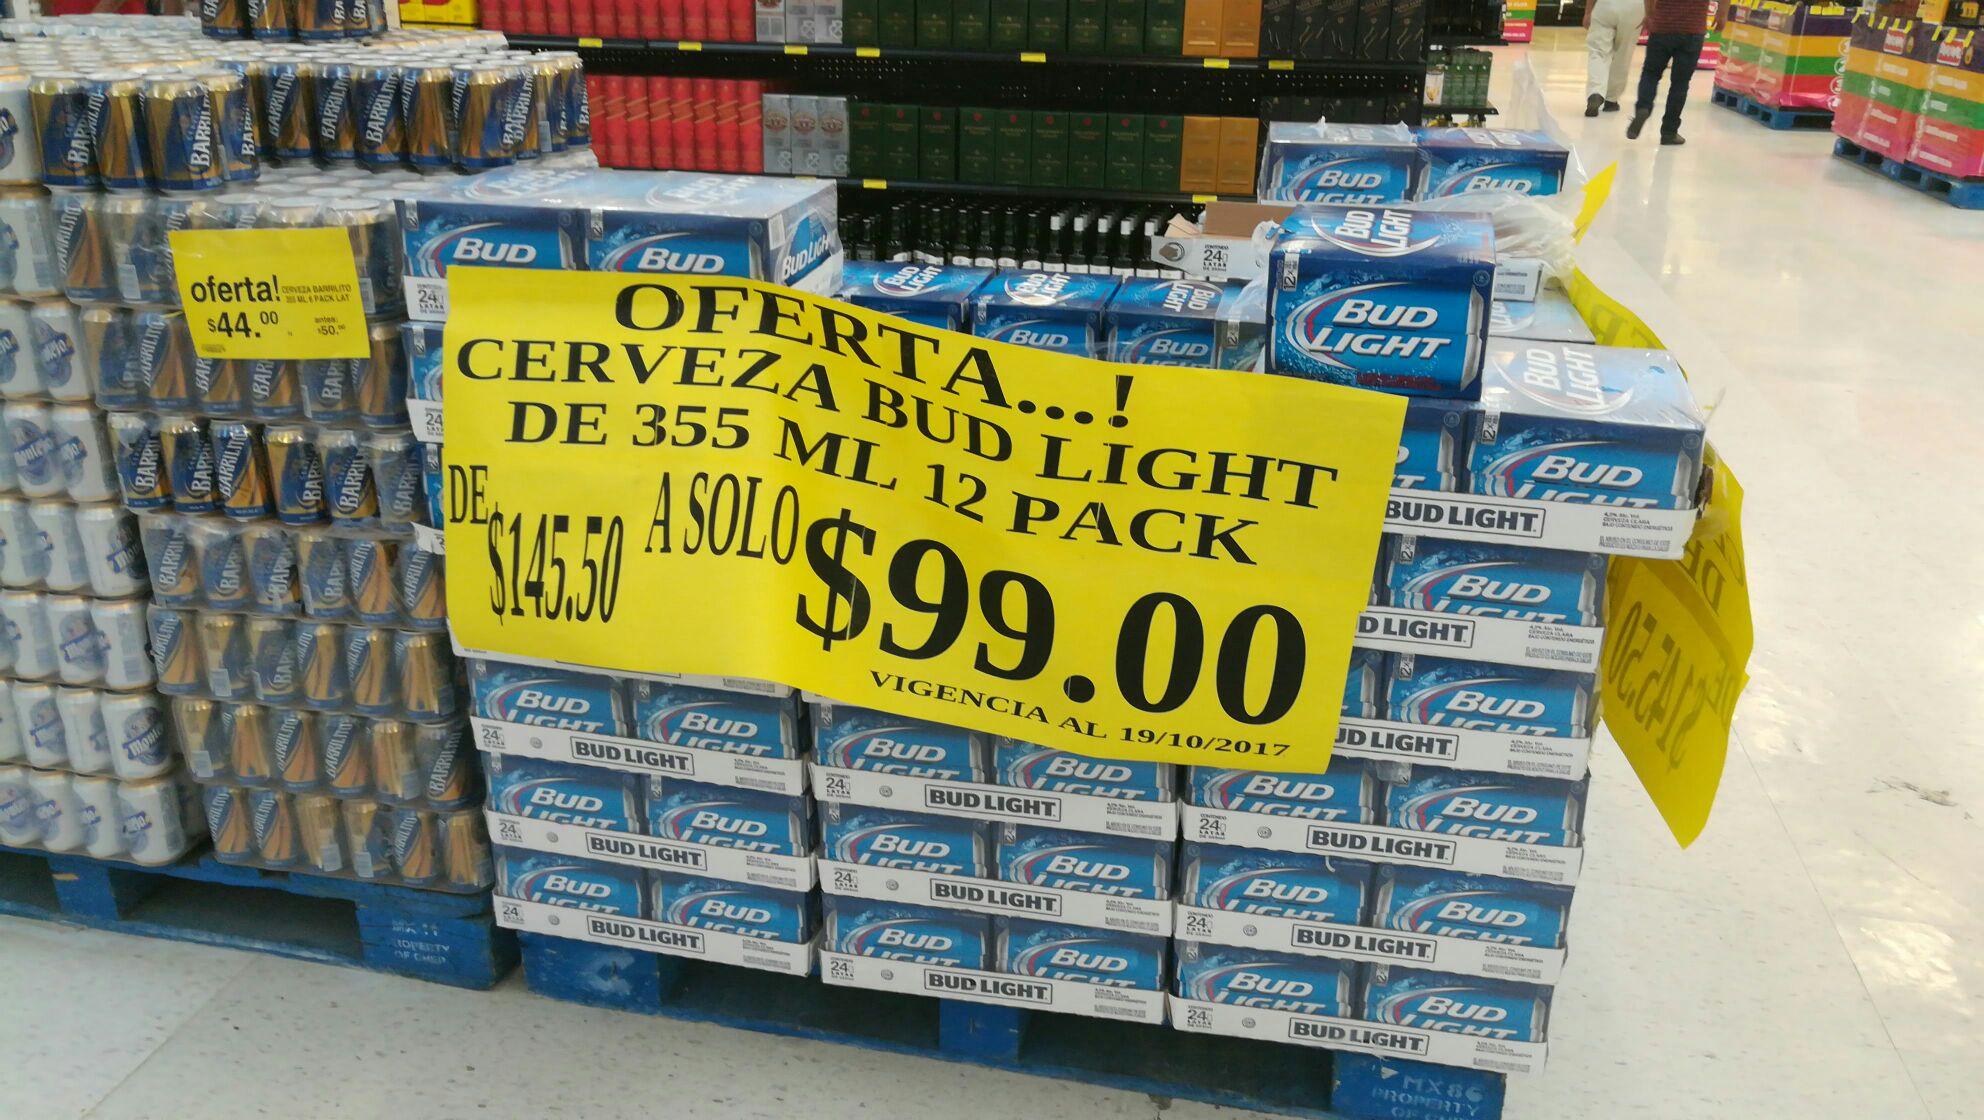 Soriana: Doce pack Bud Light lata a $99